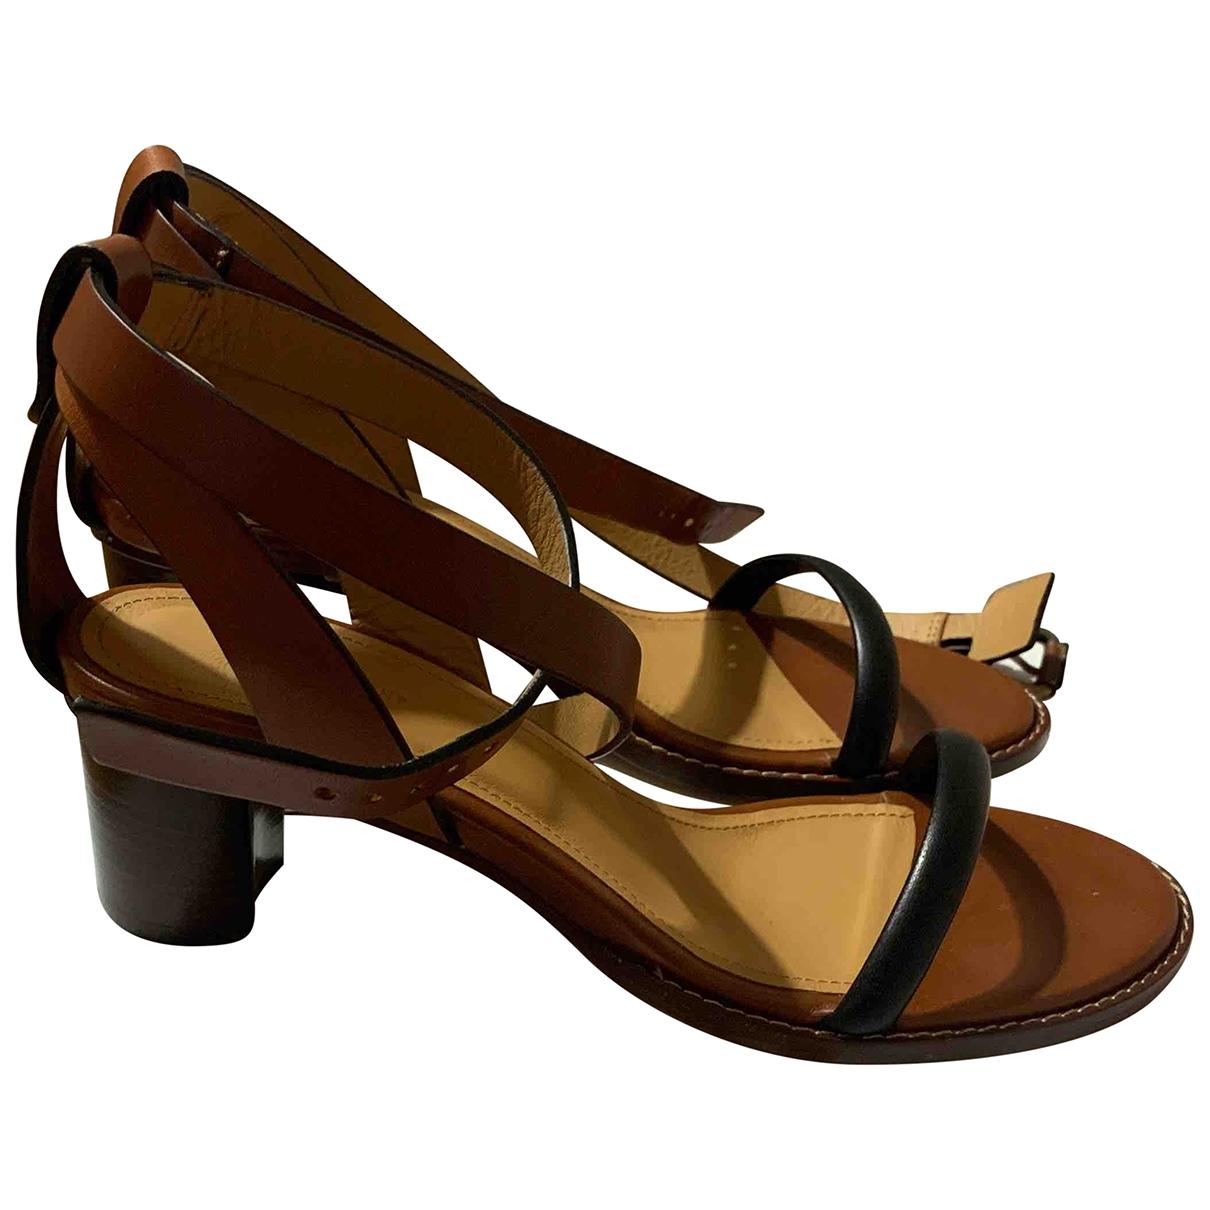 Sandalias romanas de Cuero Isabel Marant